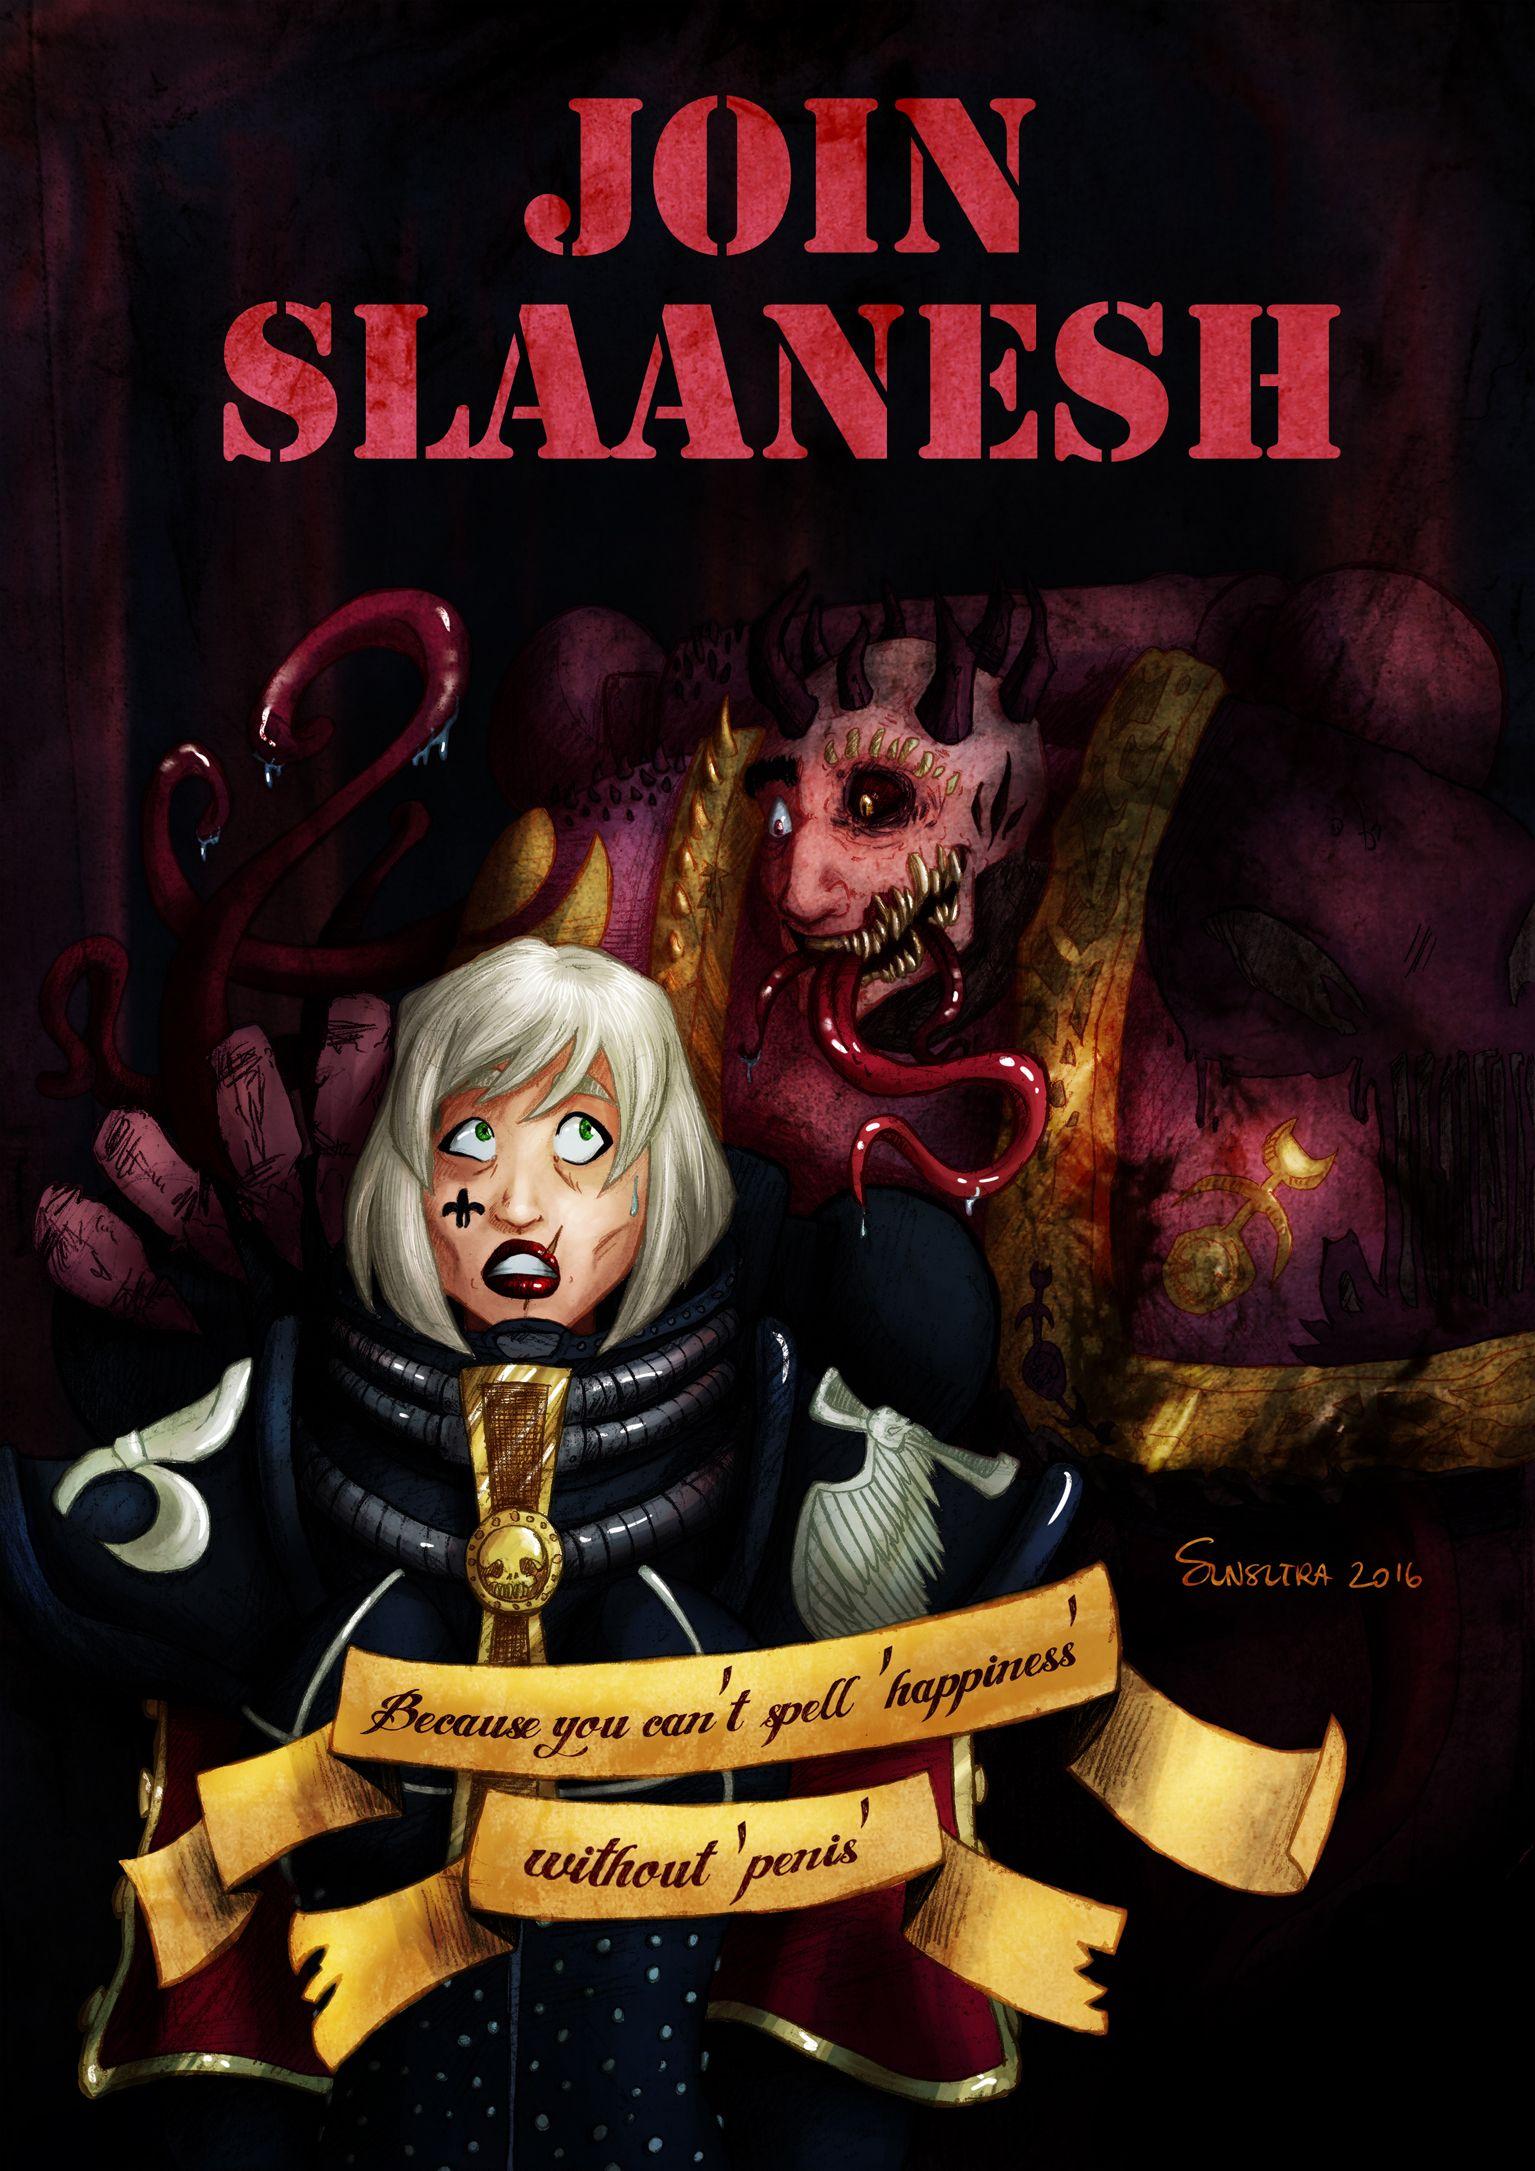 slaanesh meme - Google Search   Warhammer 40k artwork ...